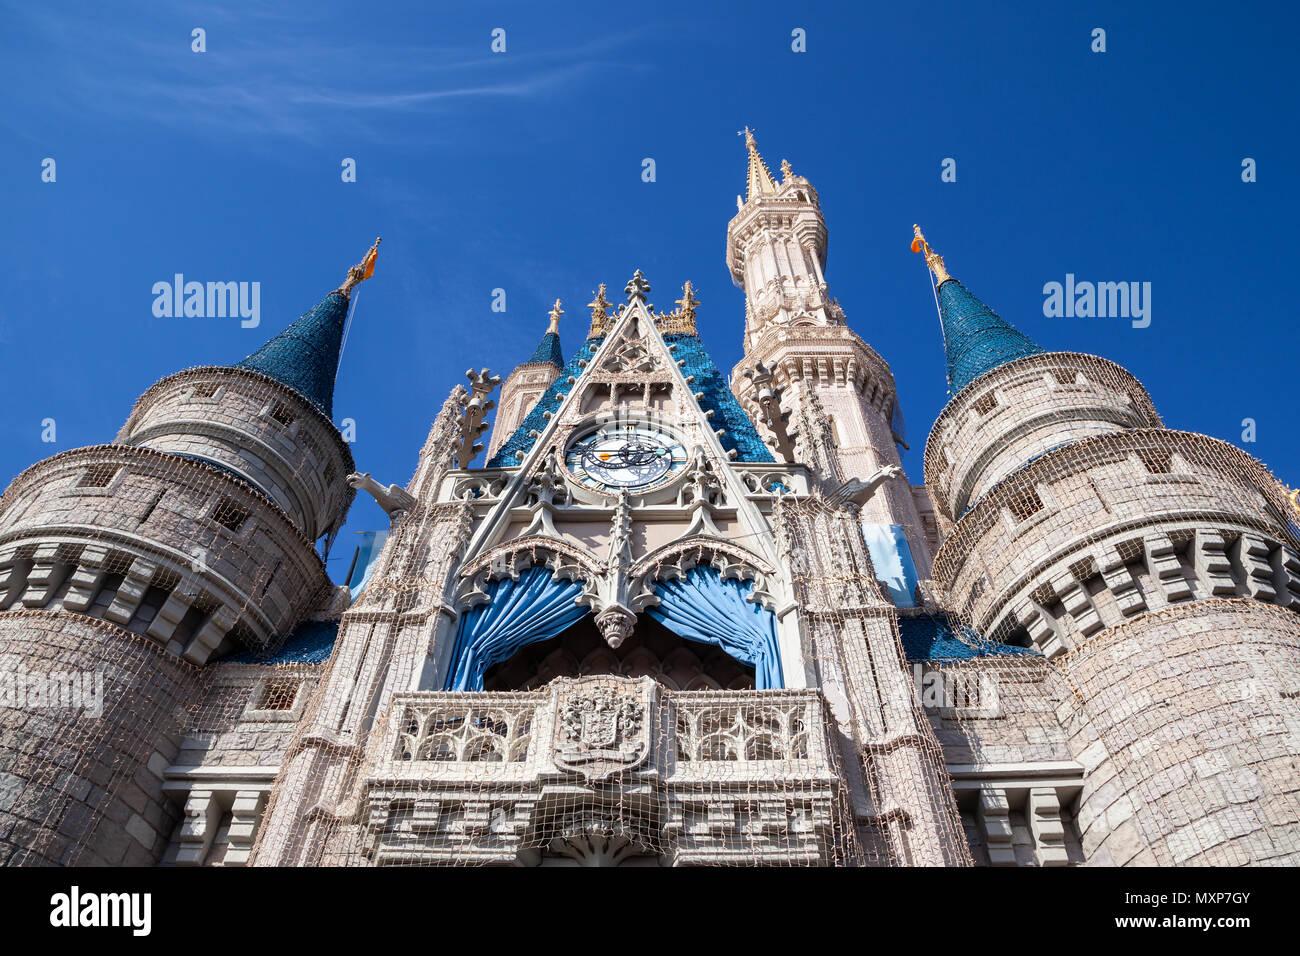 A view of Disneyland, Florida, United States. Stock Photo